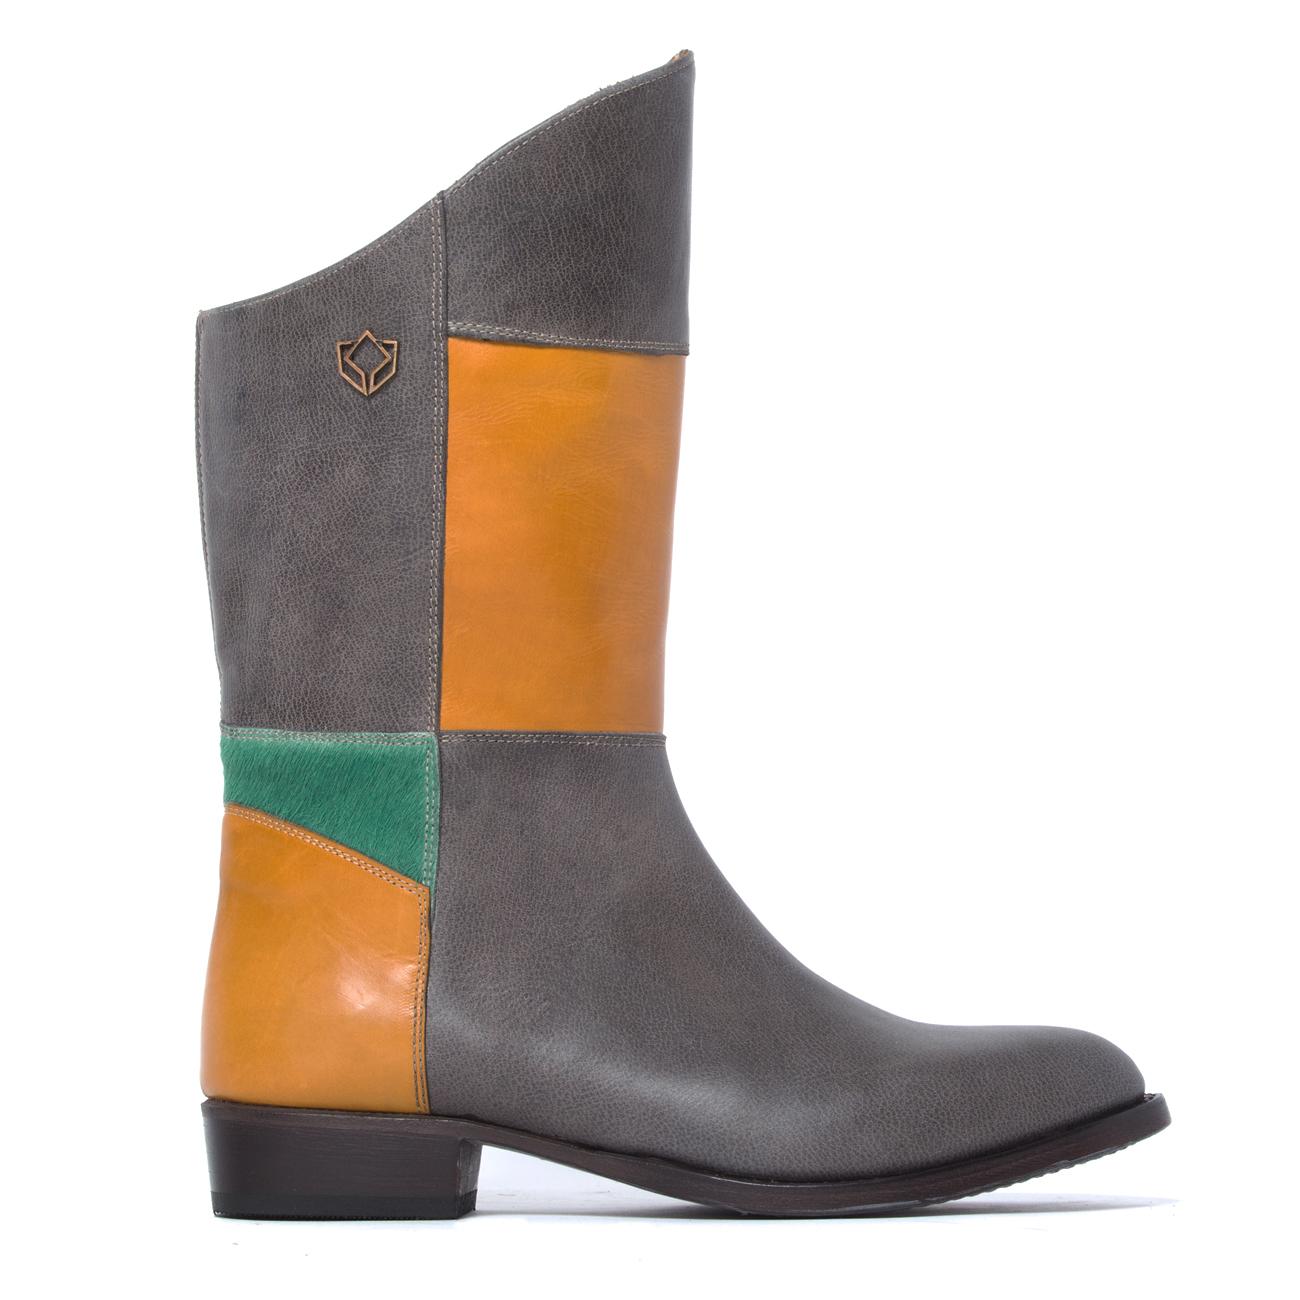 Cobra_Society_Byron_Boot_Charcoal_Cognac_Leather.jpg